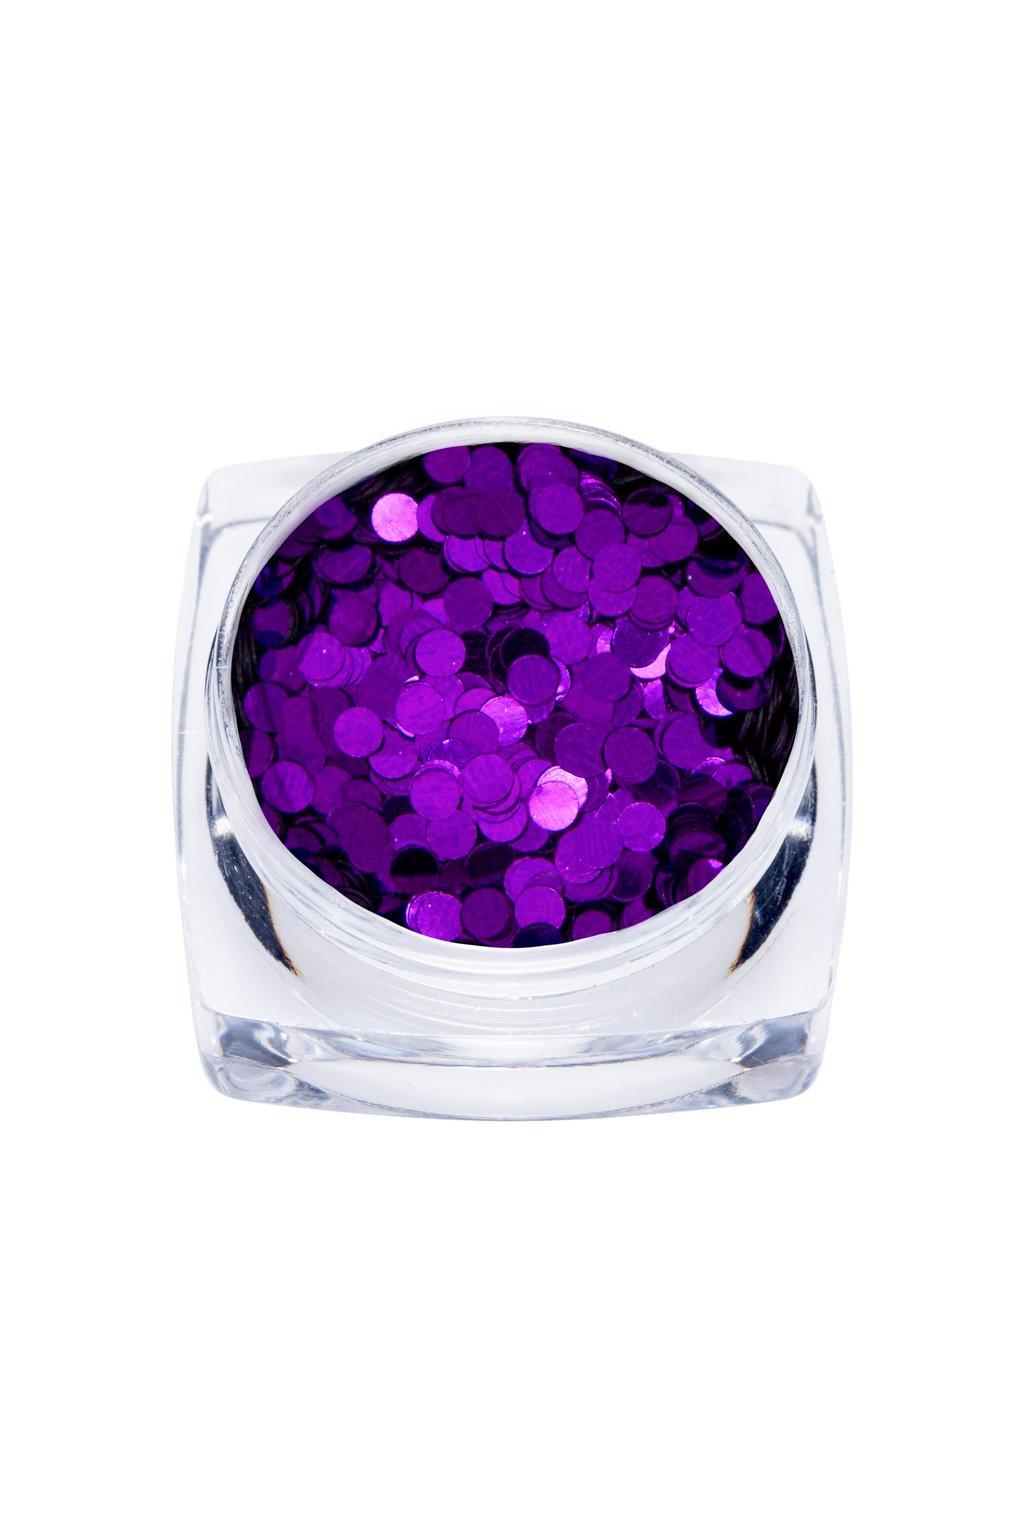 24026 minipihy chrome purple 2mm